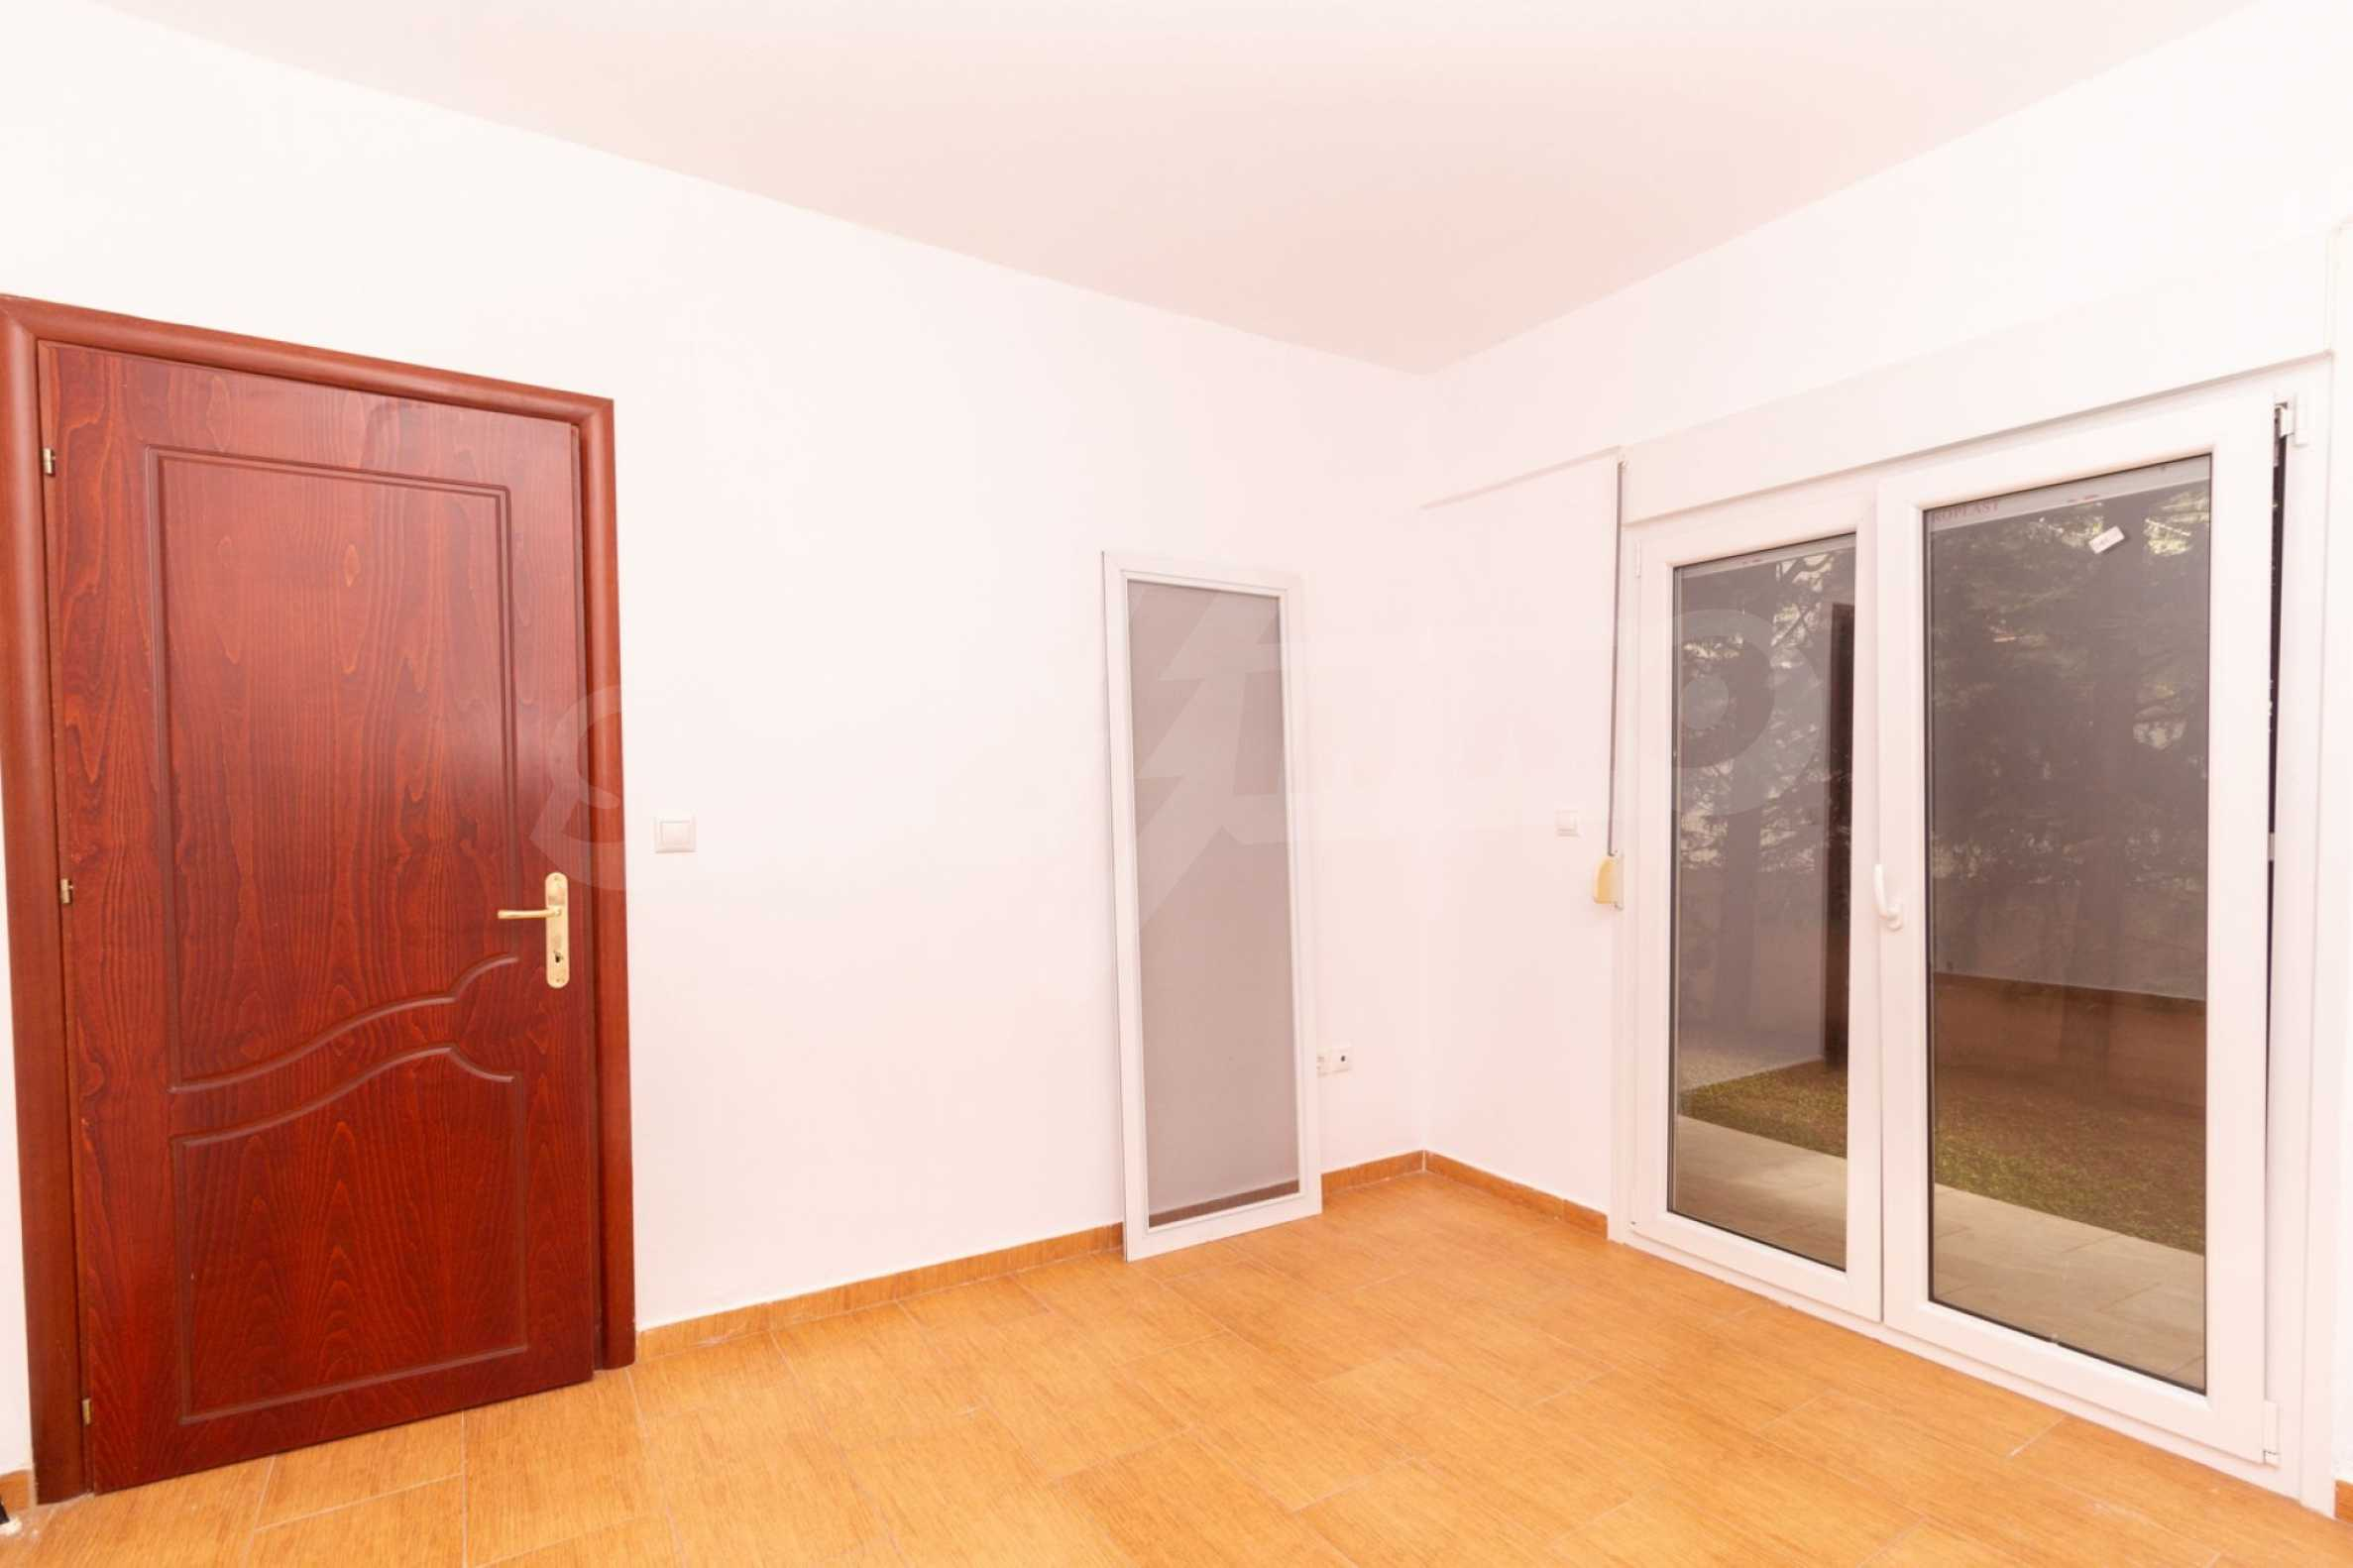 тристаен апартамент в Потидея, Касандра 26